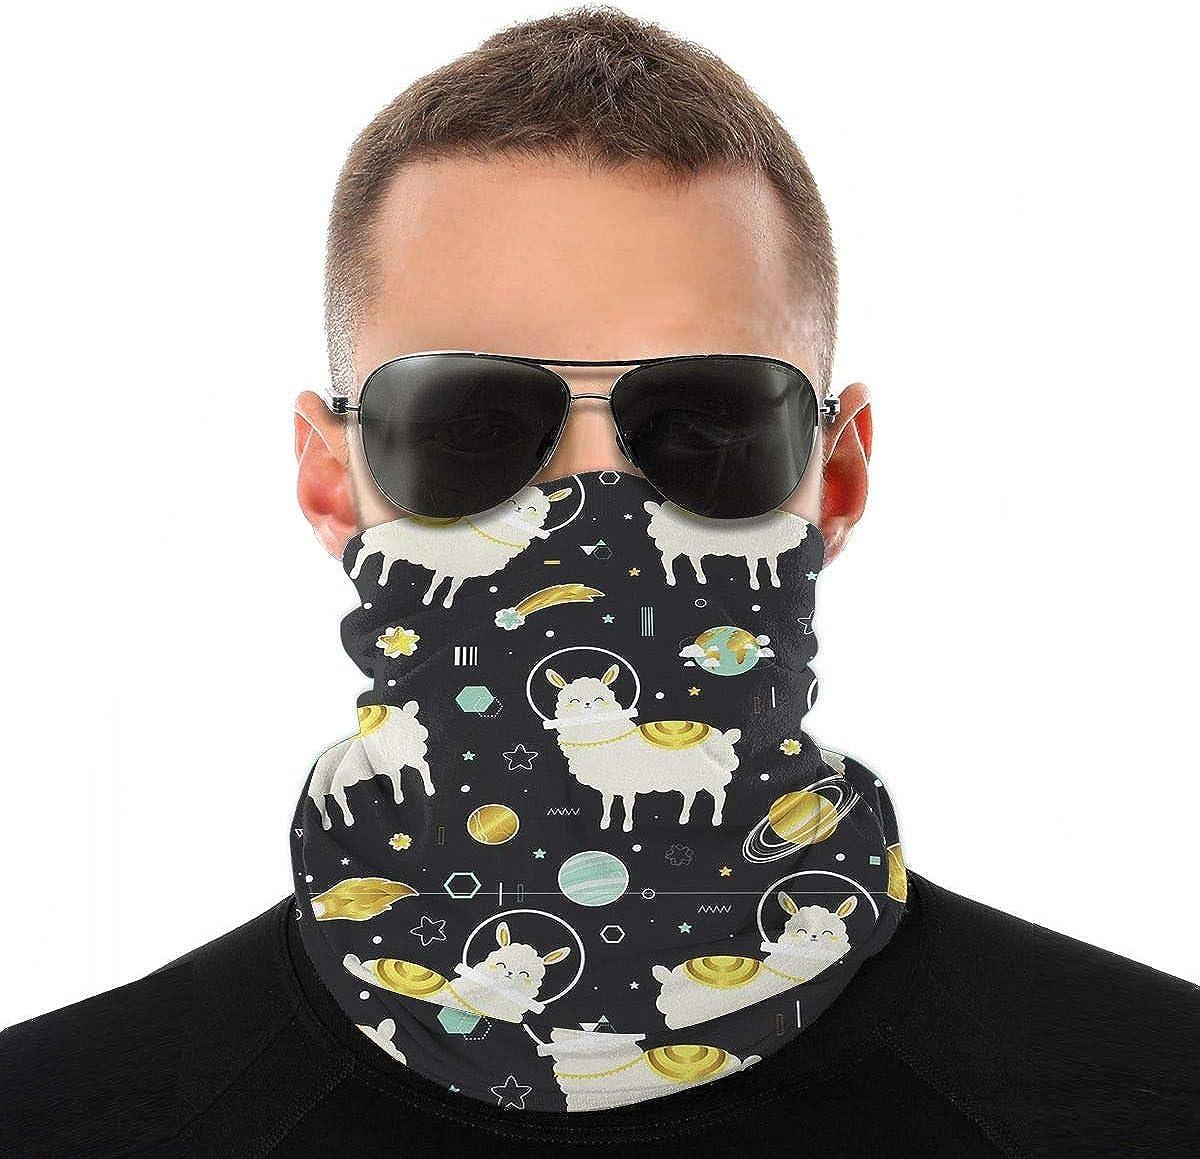 Kiuloam Bandanas Face Mask, Lamas and Planets Neck Gaiter Mask Headband for Men Women Face Scarf Dust, Outdoors, Sports